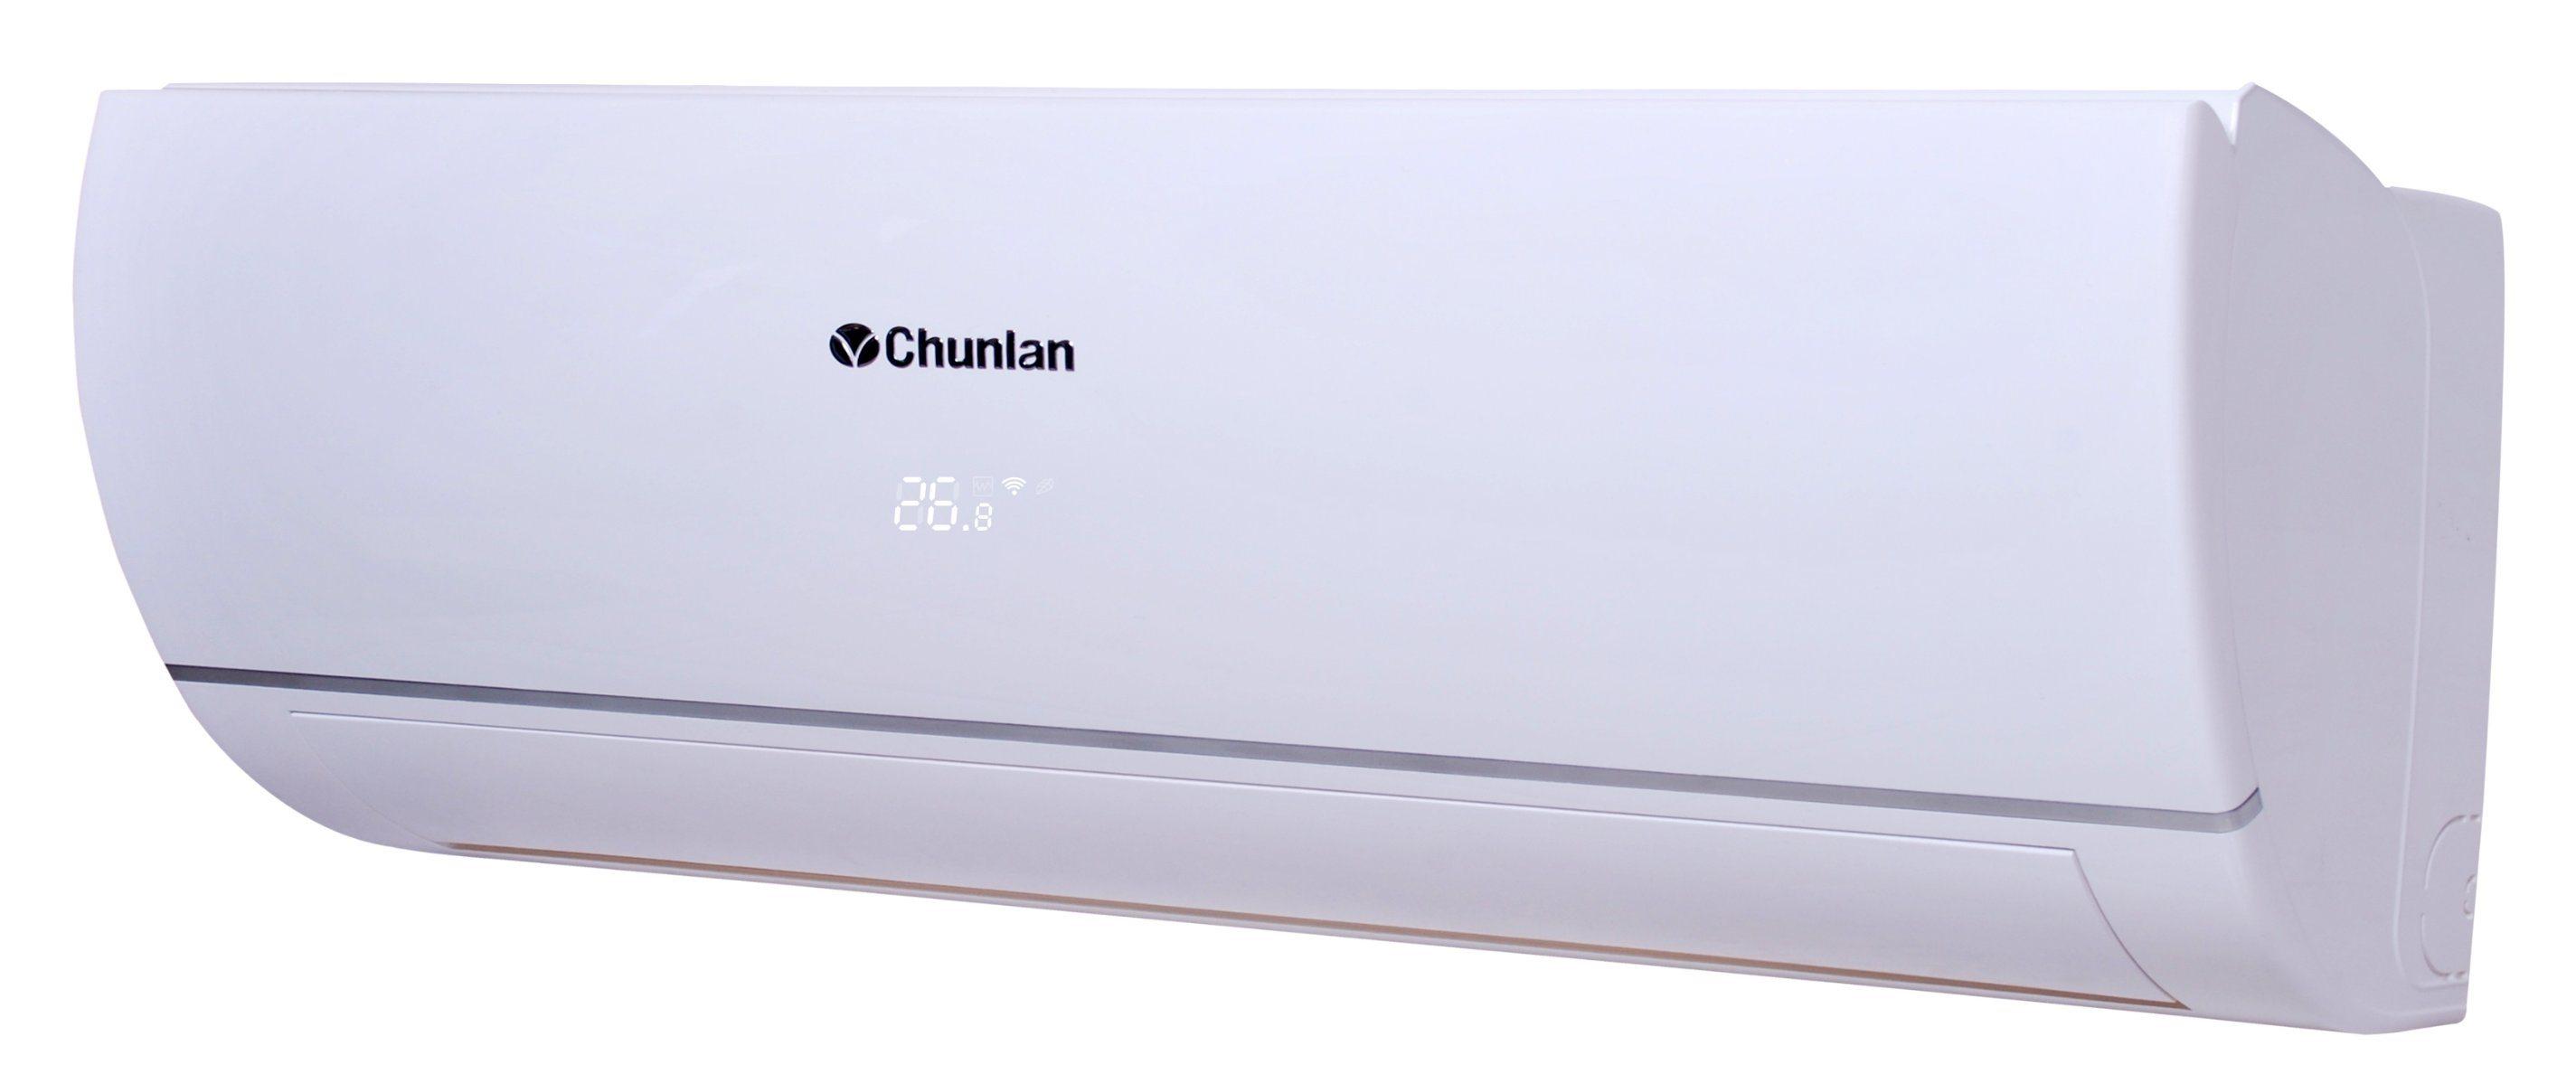 Chunlan Air Conditioner- 2 Ton